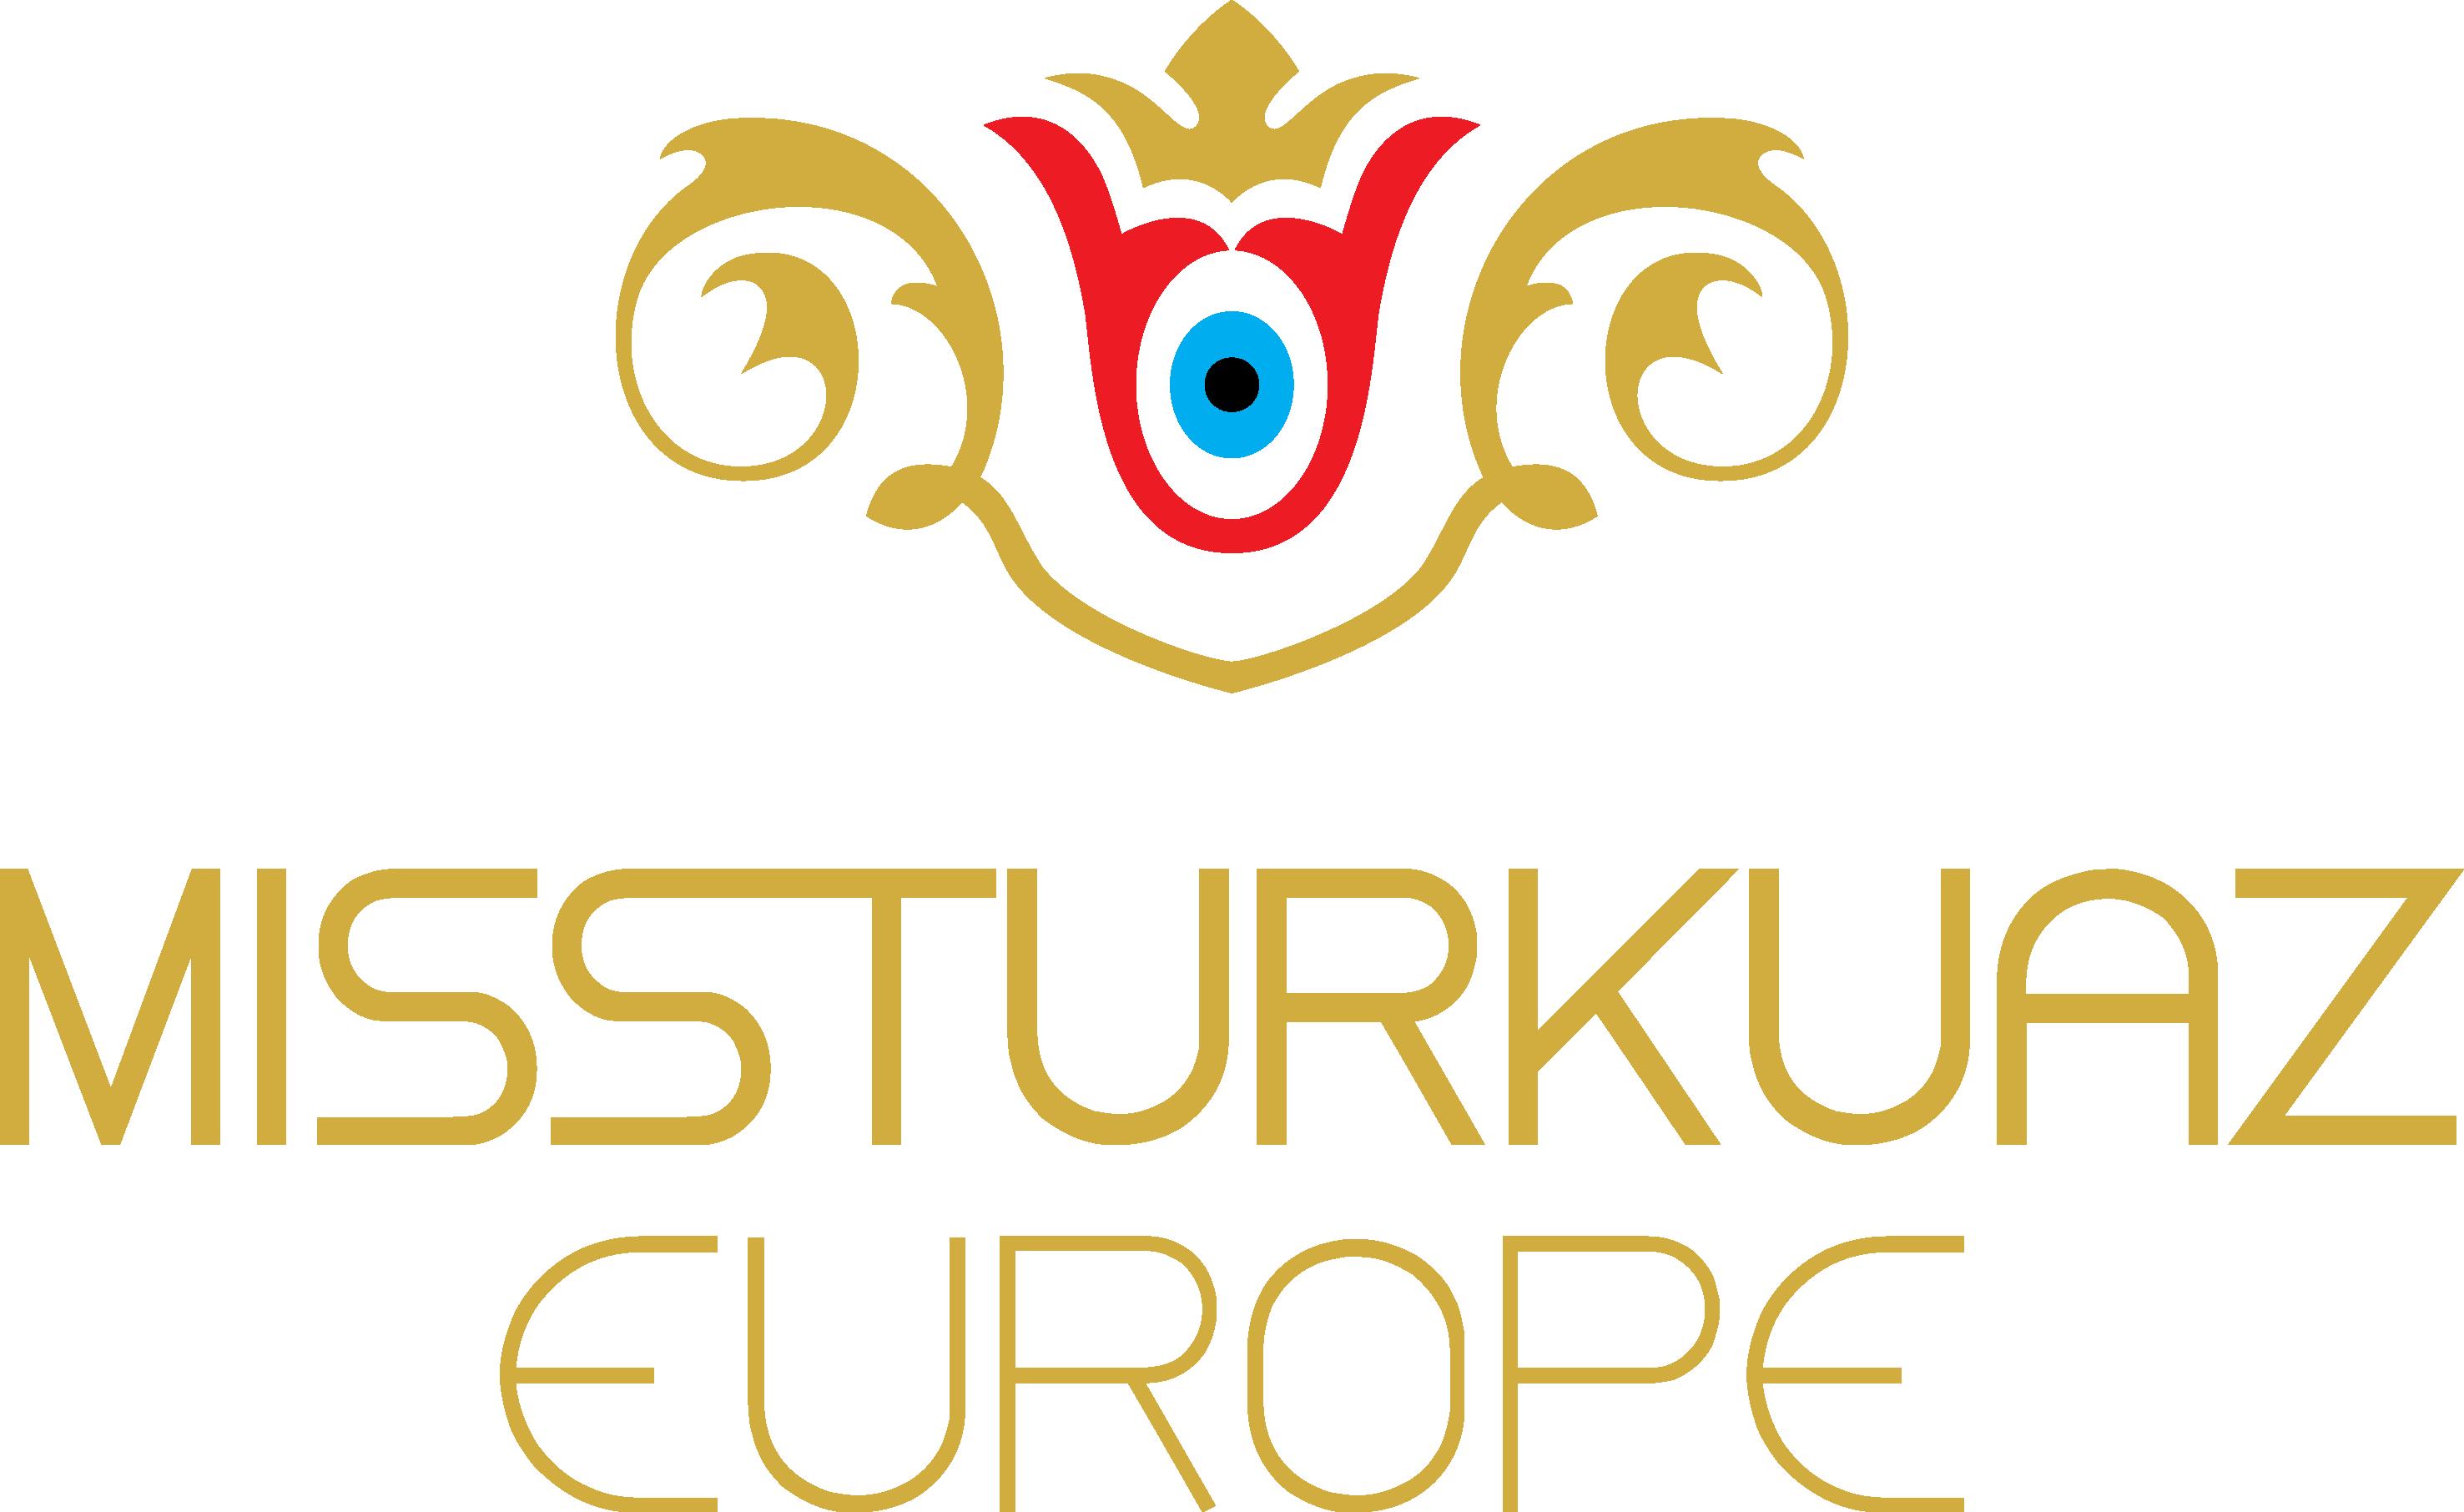 MISS TURKUAZ EUROPE